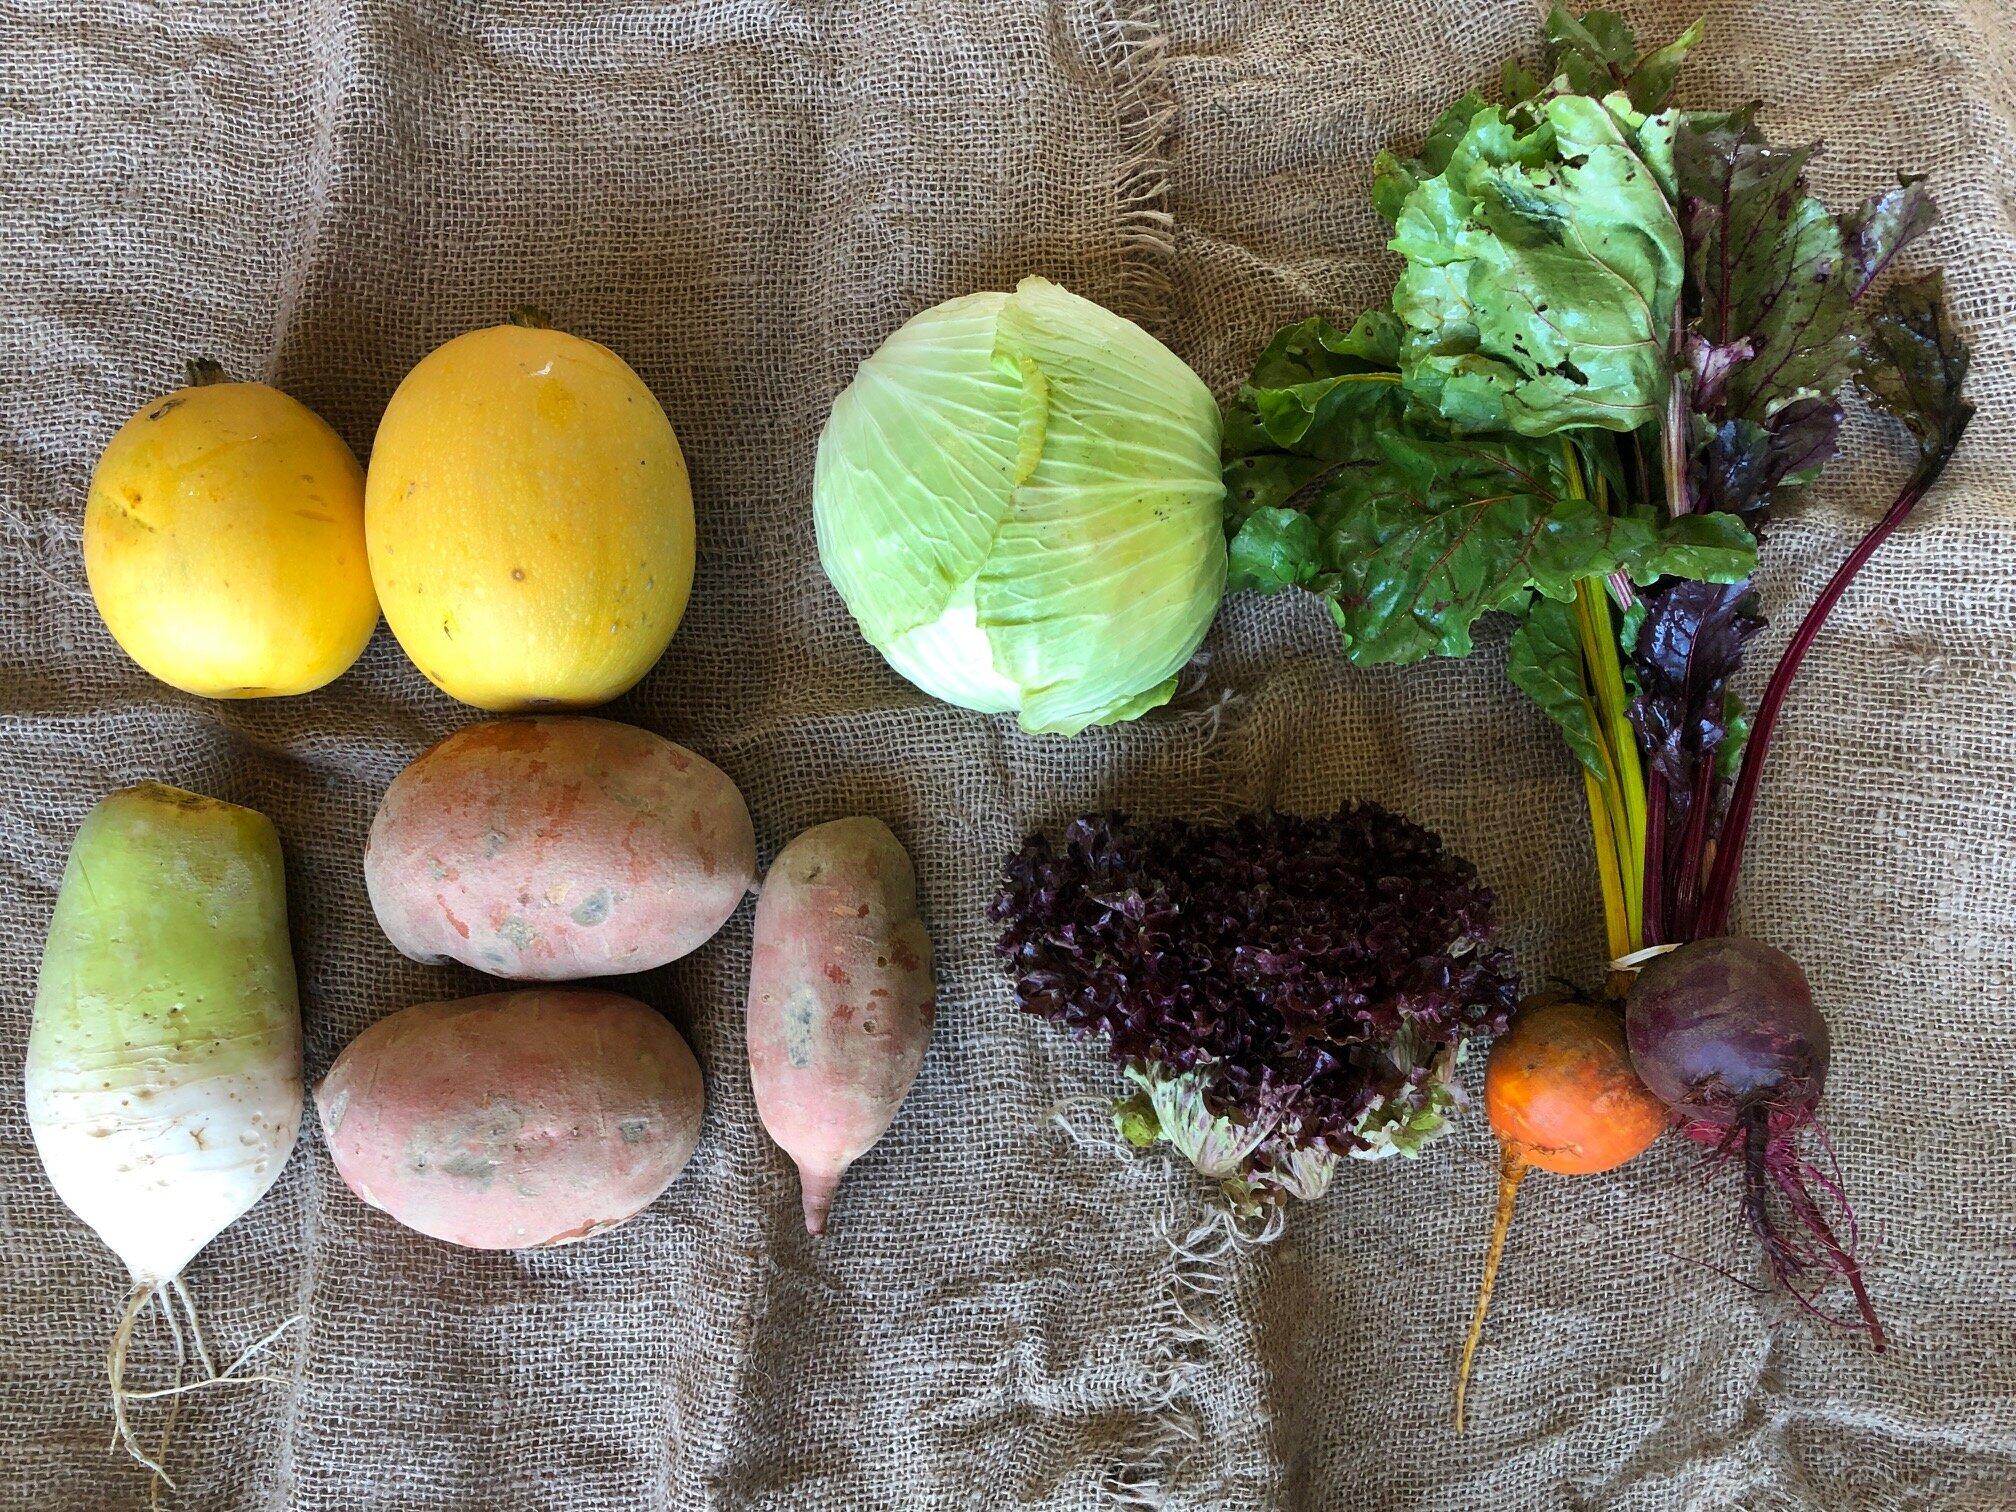 WEEK 4:   3 lbs Sweet Potatoes  1 head Red Cabbage  1 bunch Beets  2 Spaghetti Squash  1 bunch Lettuce  1 Korean Moo Radish